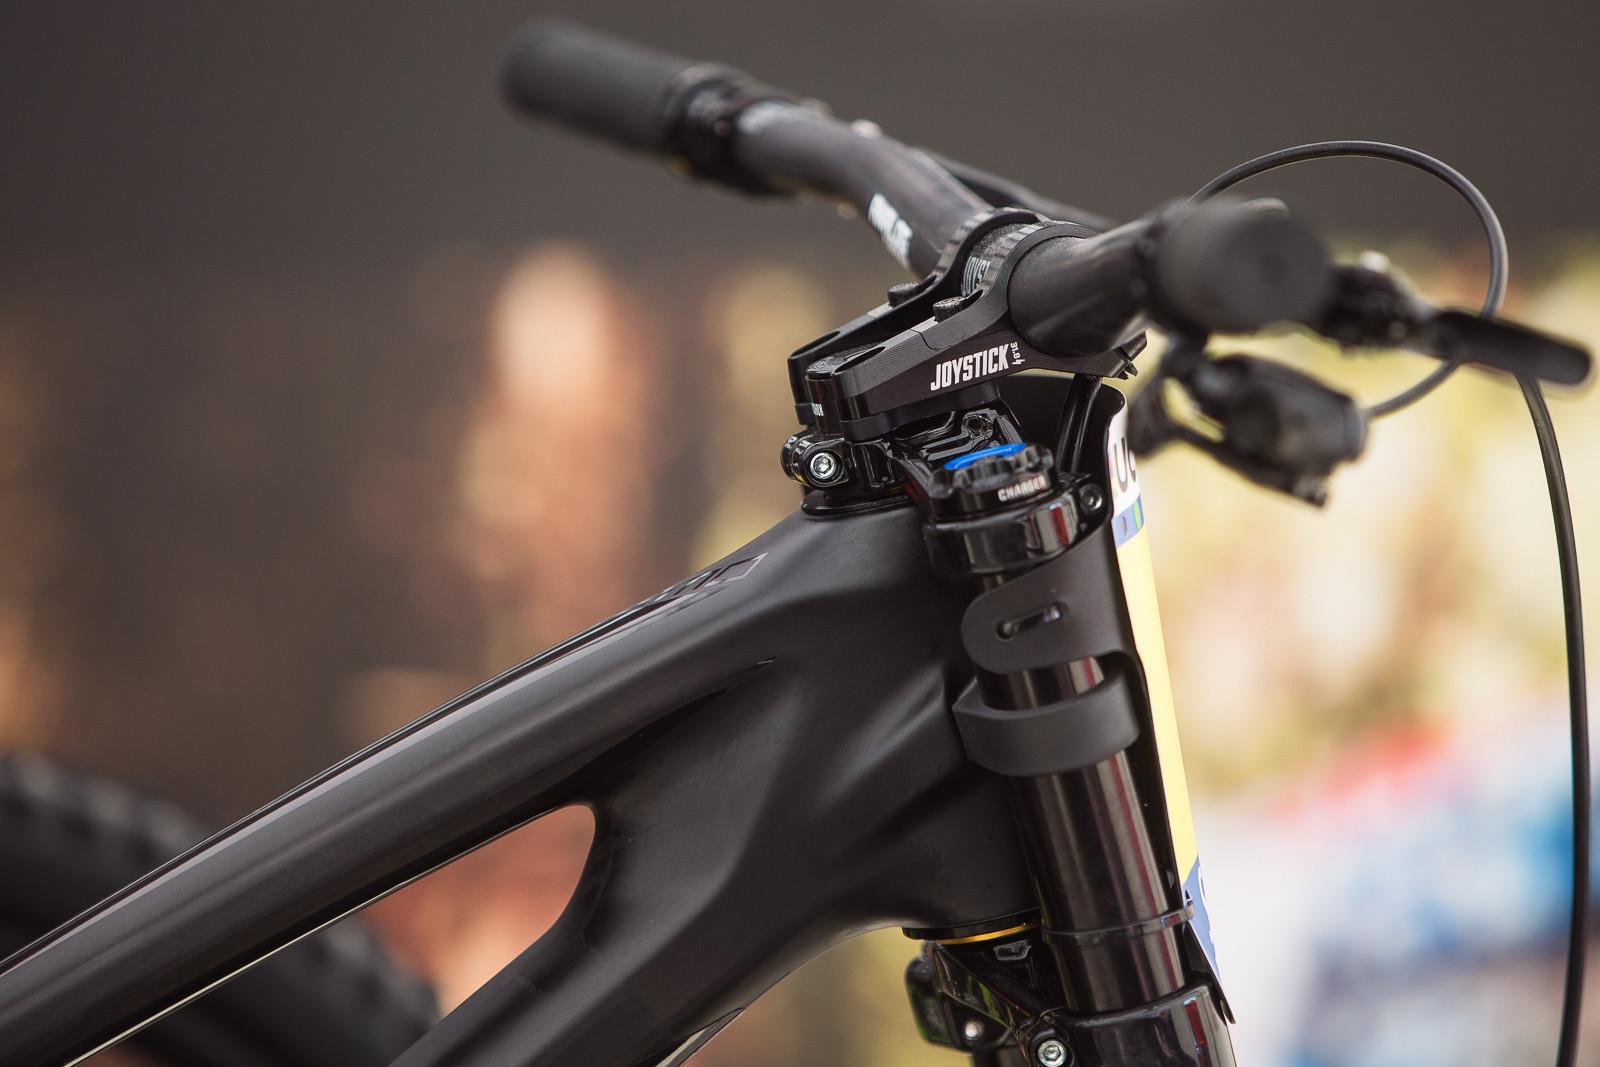 Joystick Direct Mount Stem - PIT BITS - Fort William World Cup - Mountain Biking Pictures - Vital MTB